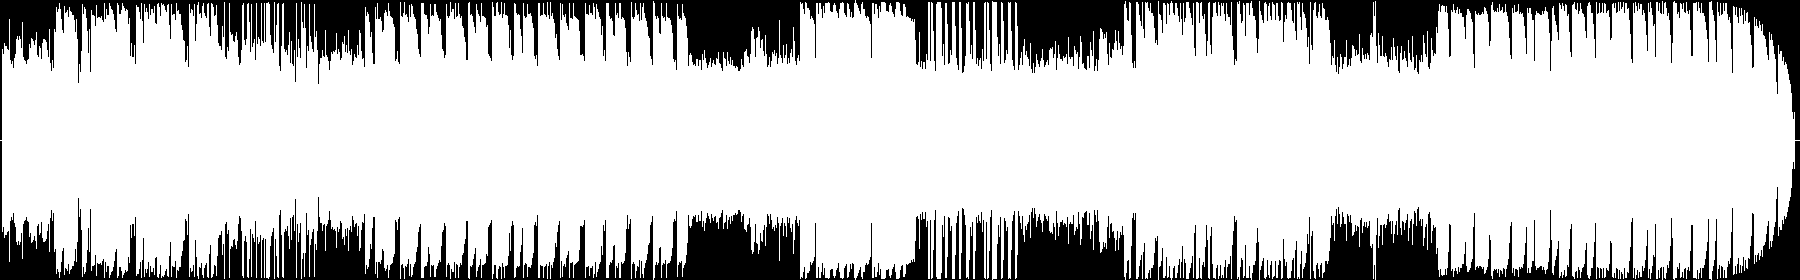 The Guitar Plug audio waveform